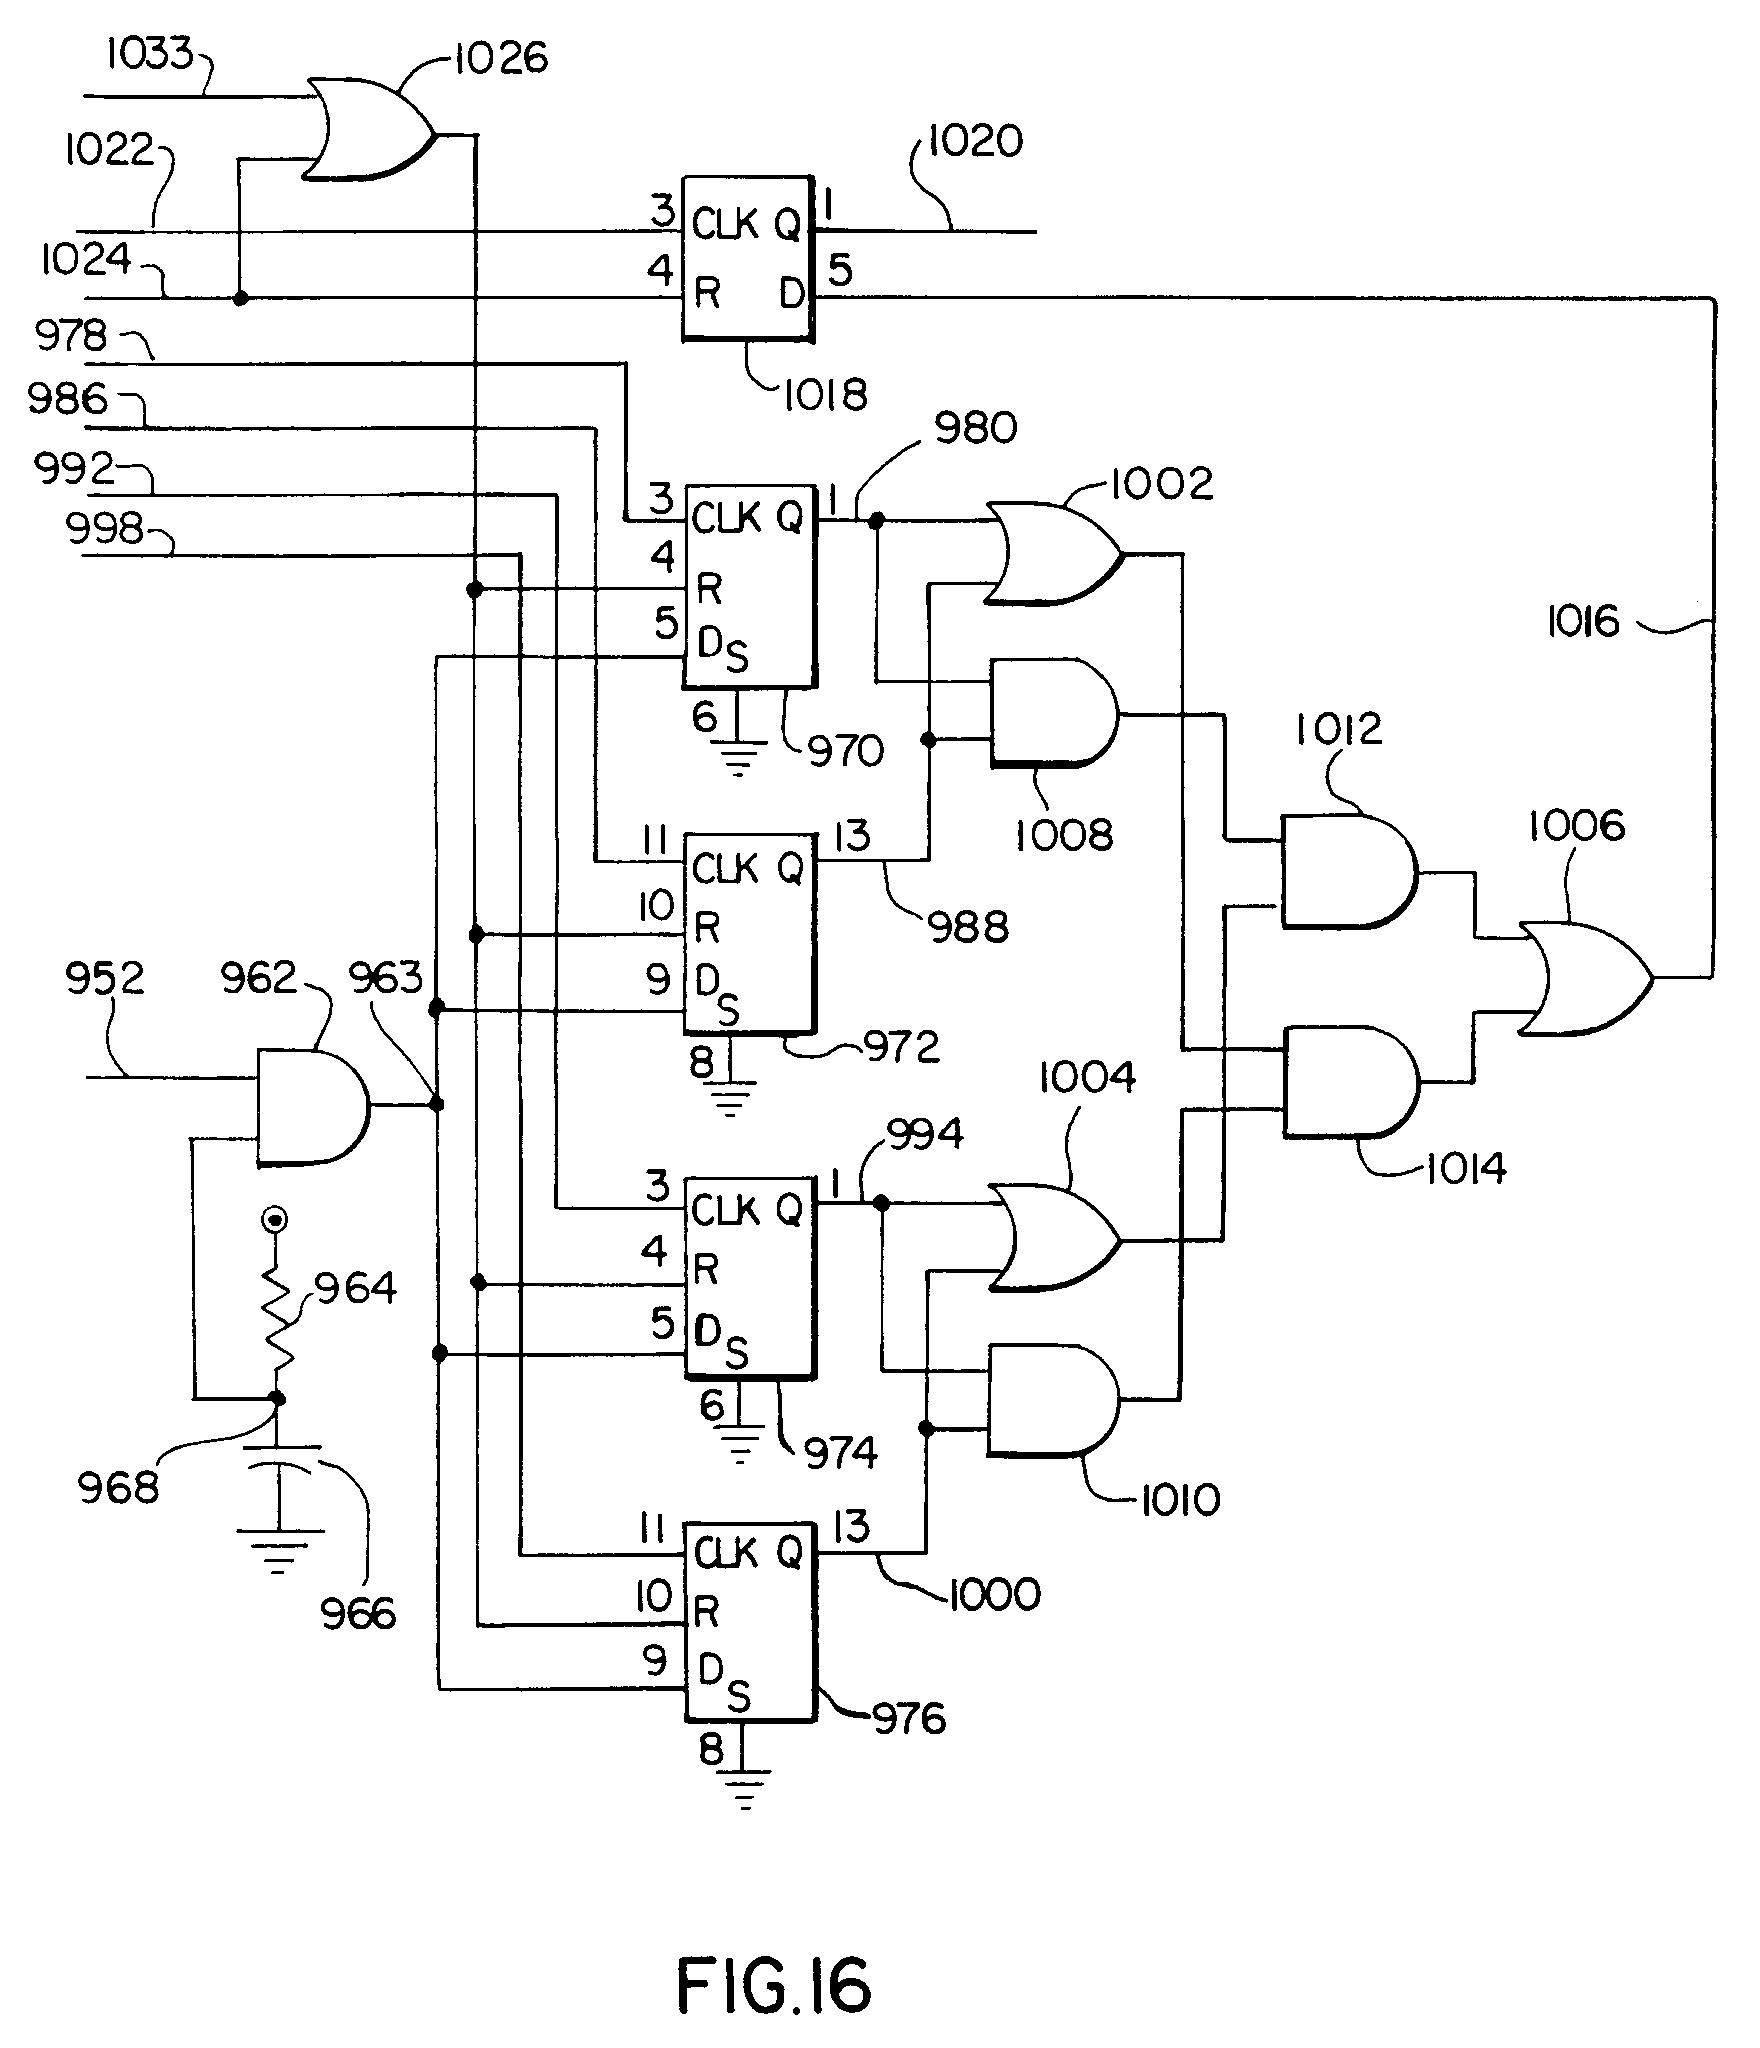 Edwards 592 Transformer Wiring Diagram - Mb C300 Wiring Diagram List Mega  Schematic7.mtd.institut-triskell-de-diamant.fr